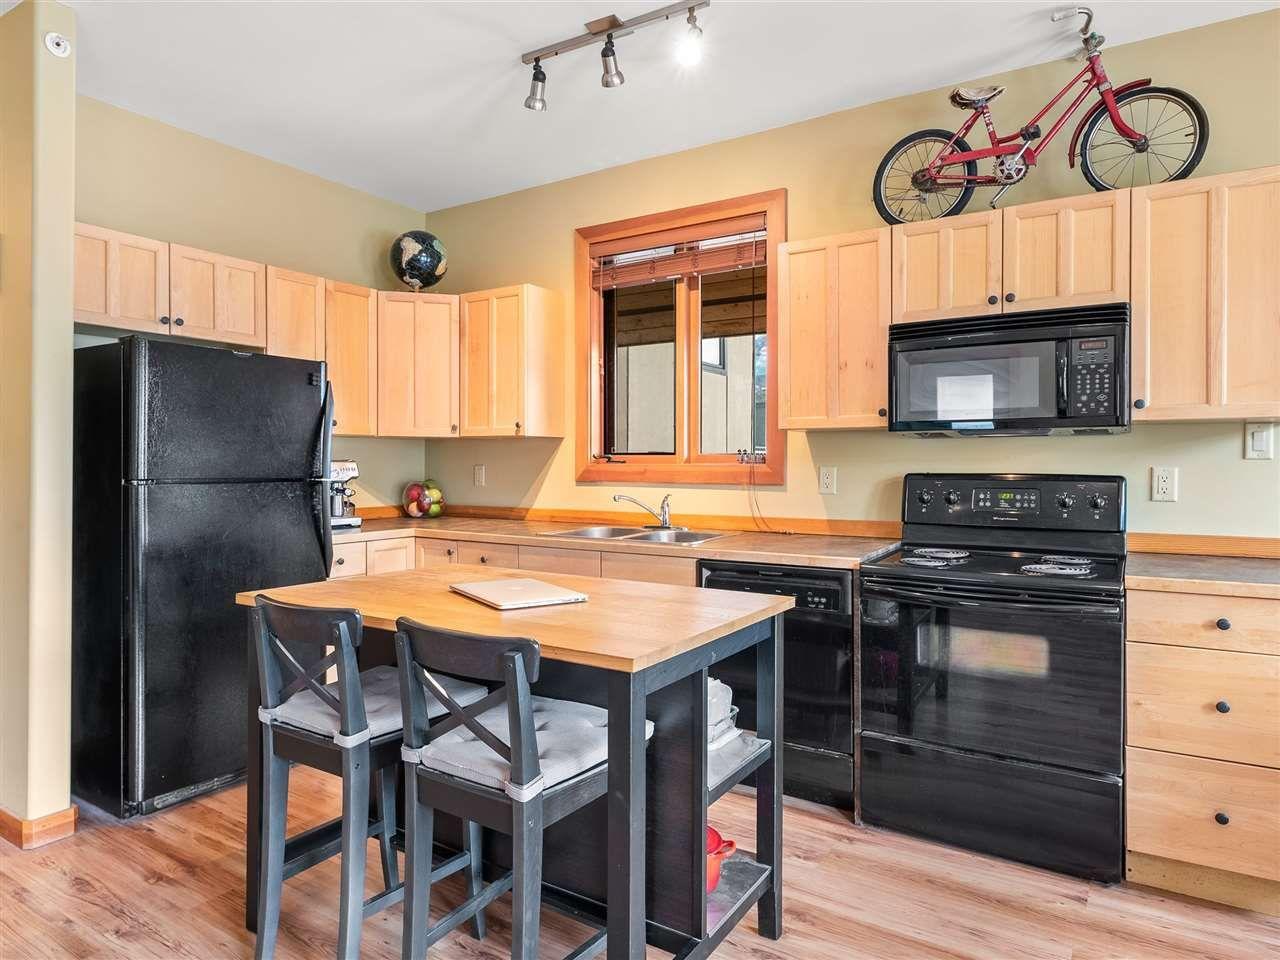 Photo 36: Photos: 1766 PINEWOOD DRIVE: Pemberton House for sale : MLS®# R2543608